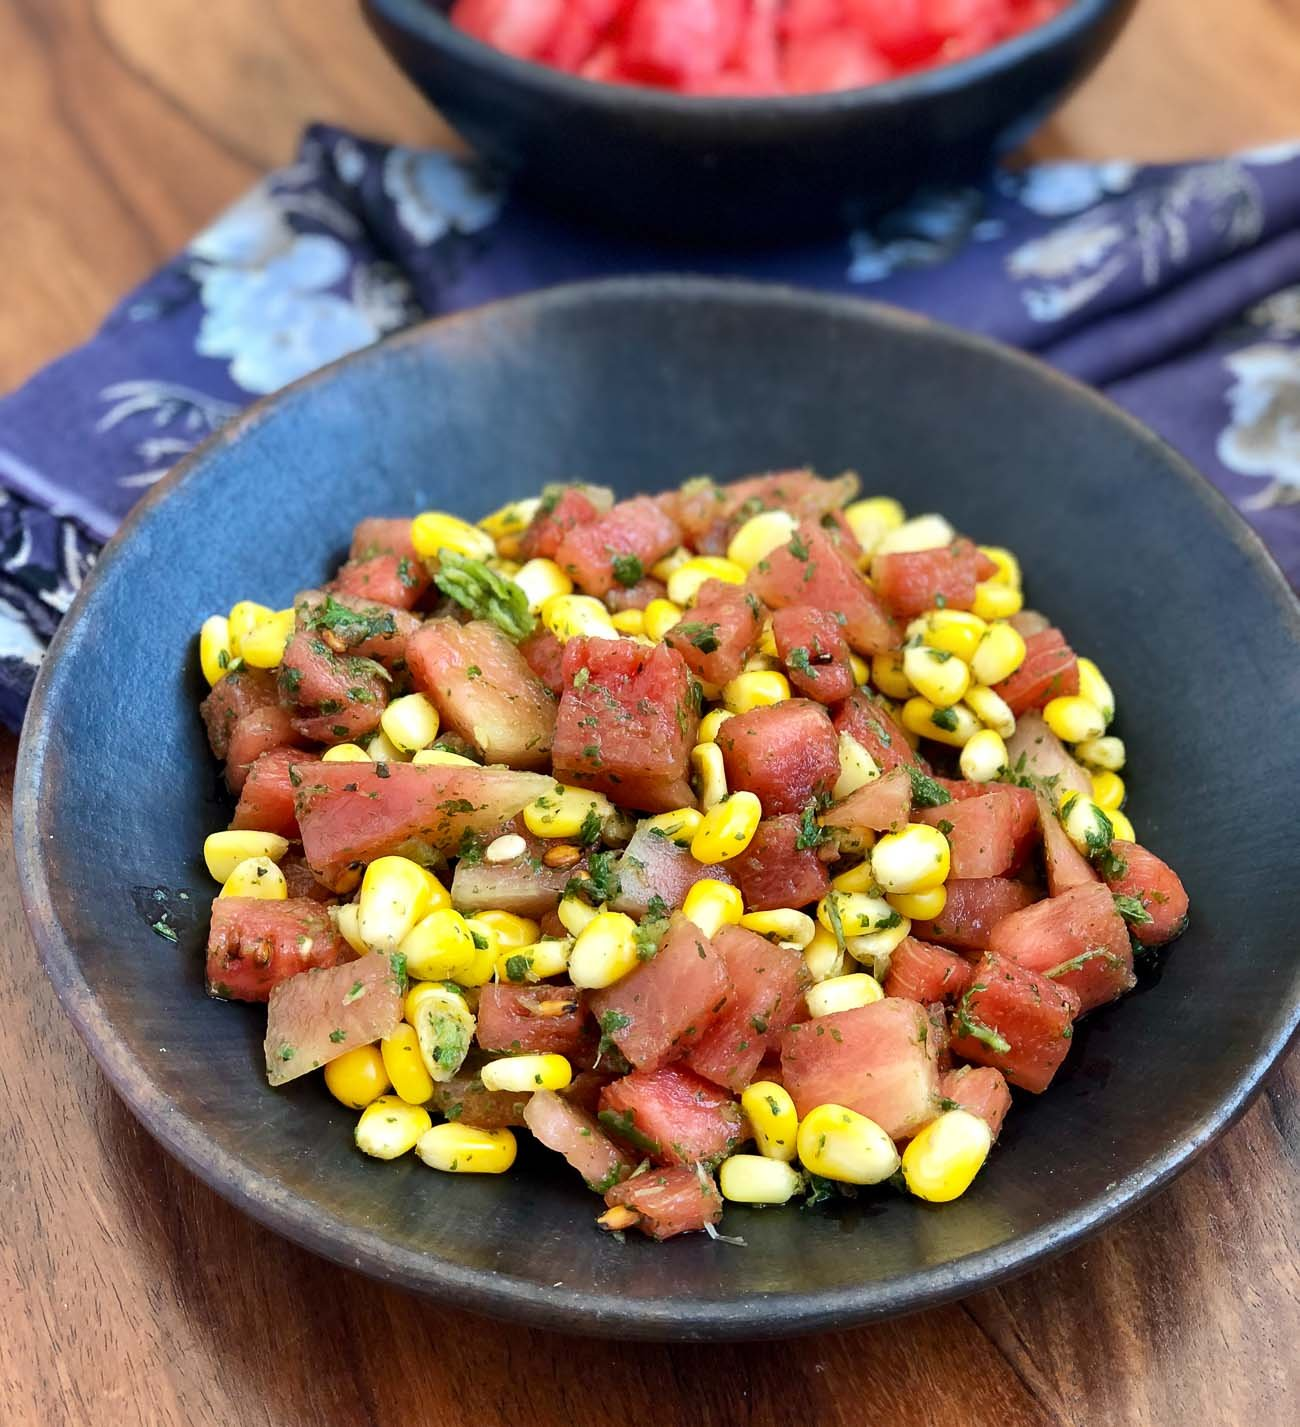 Watermelon And Corn Salad Recipe - A Refreshing Summer Salad